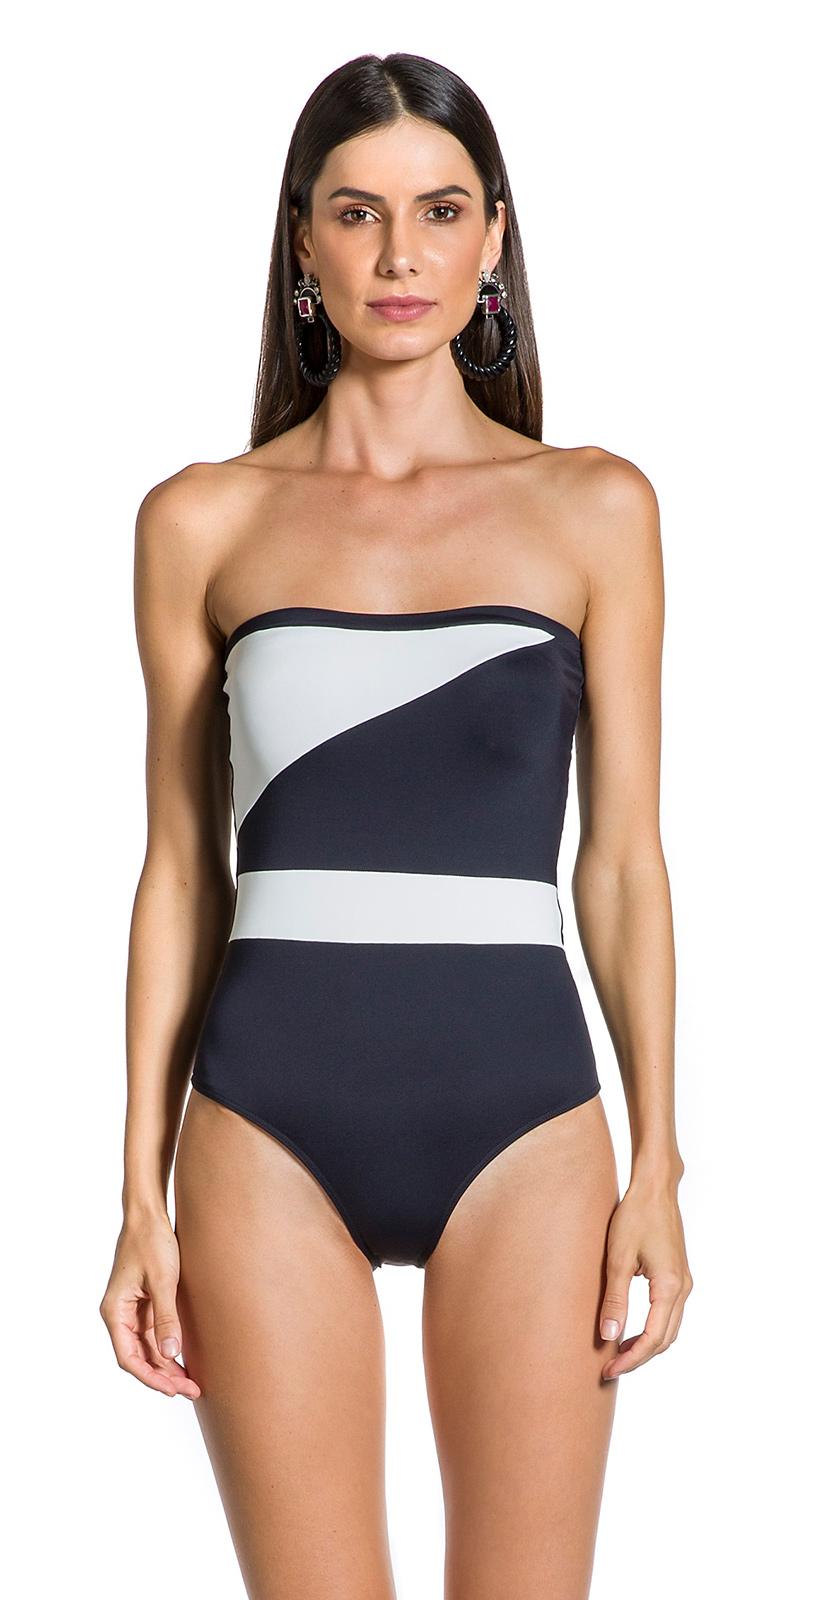 9238ef6b46 Black and white bandeau one-piece swimsuit - BODY P&B PRETO ...